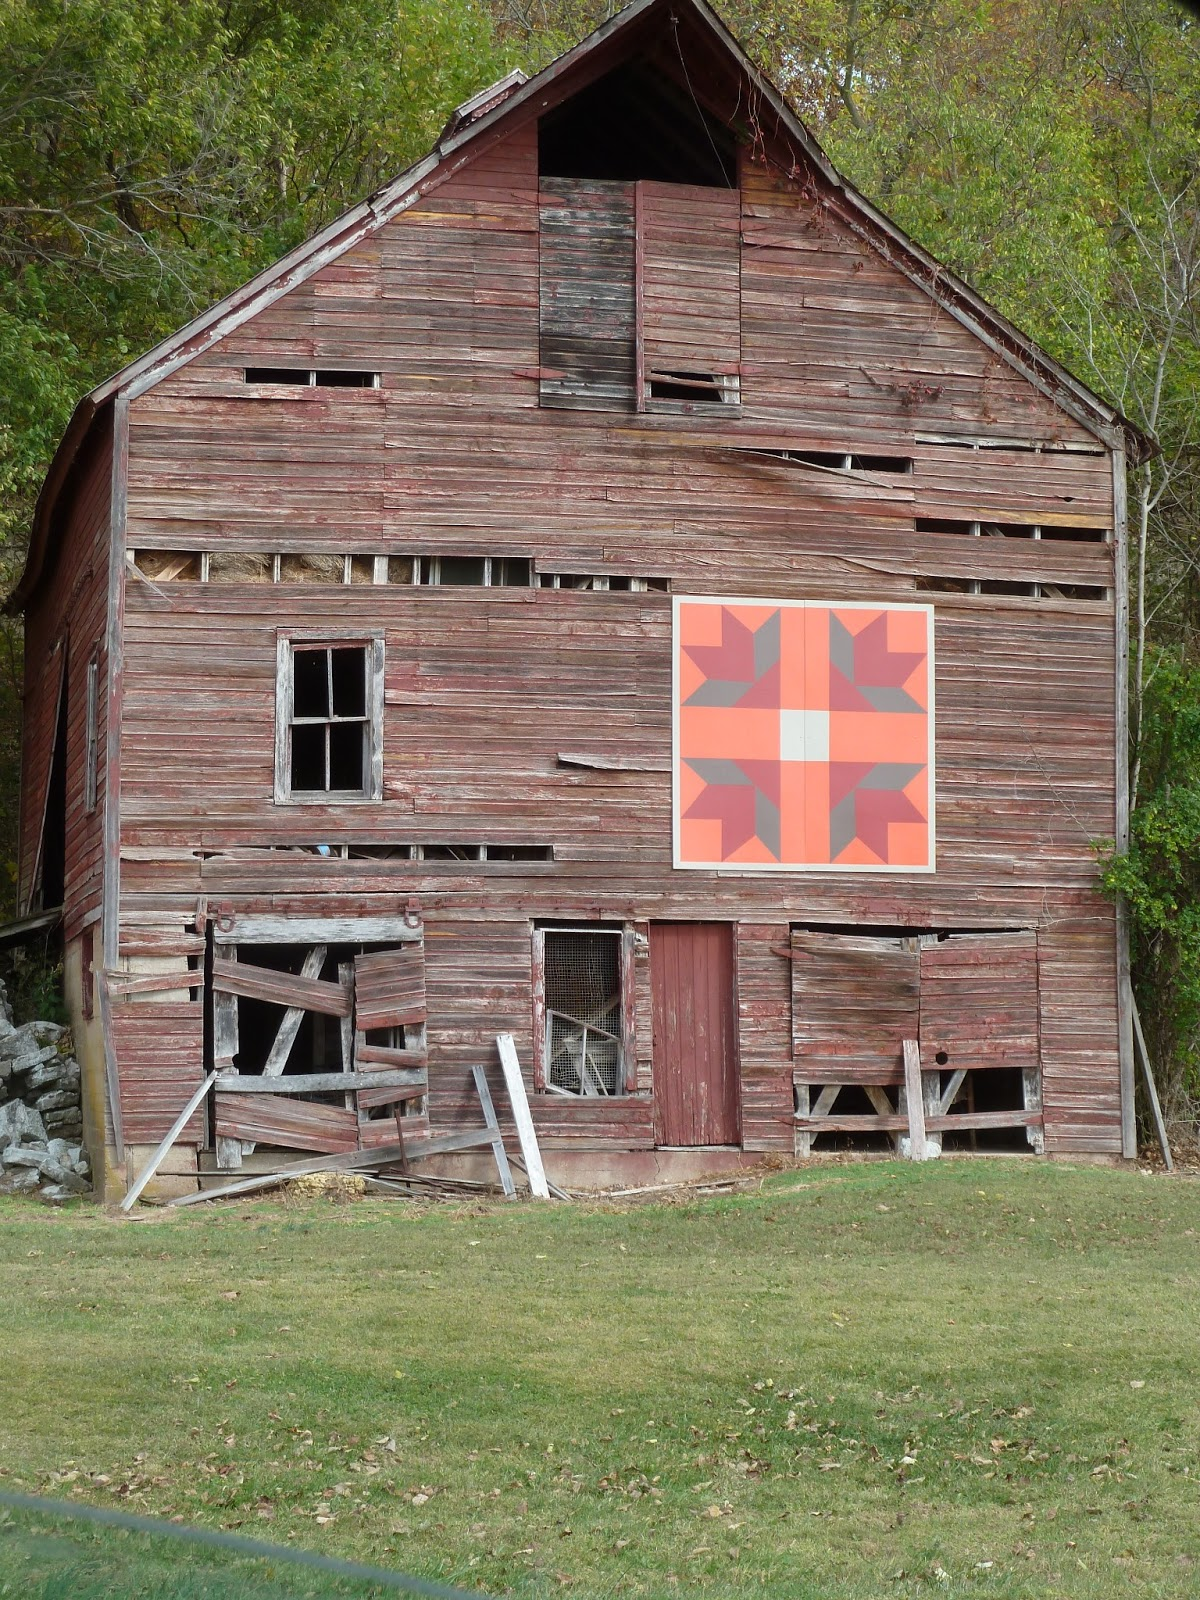 Barn Quilts Calhoun County Illinois